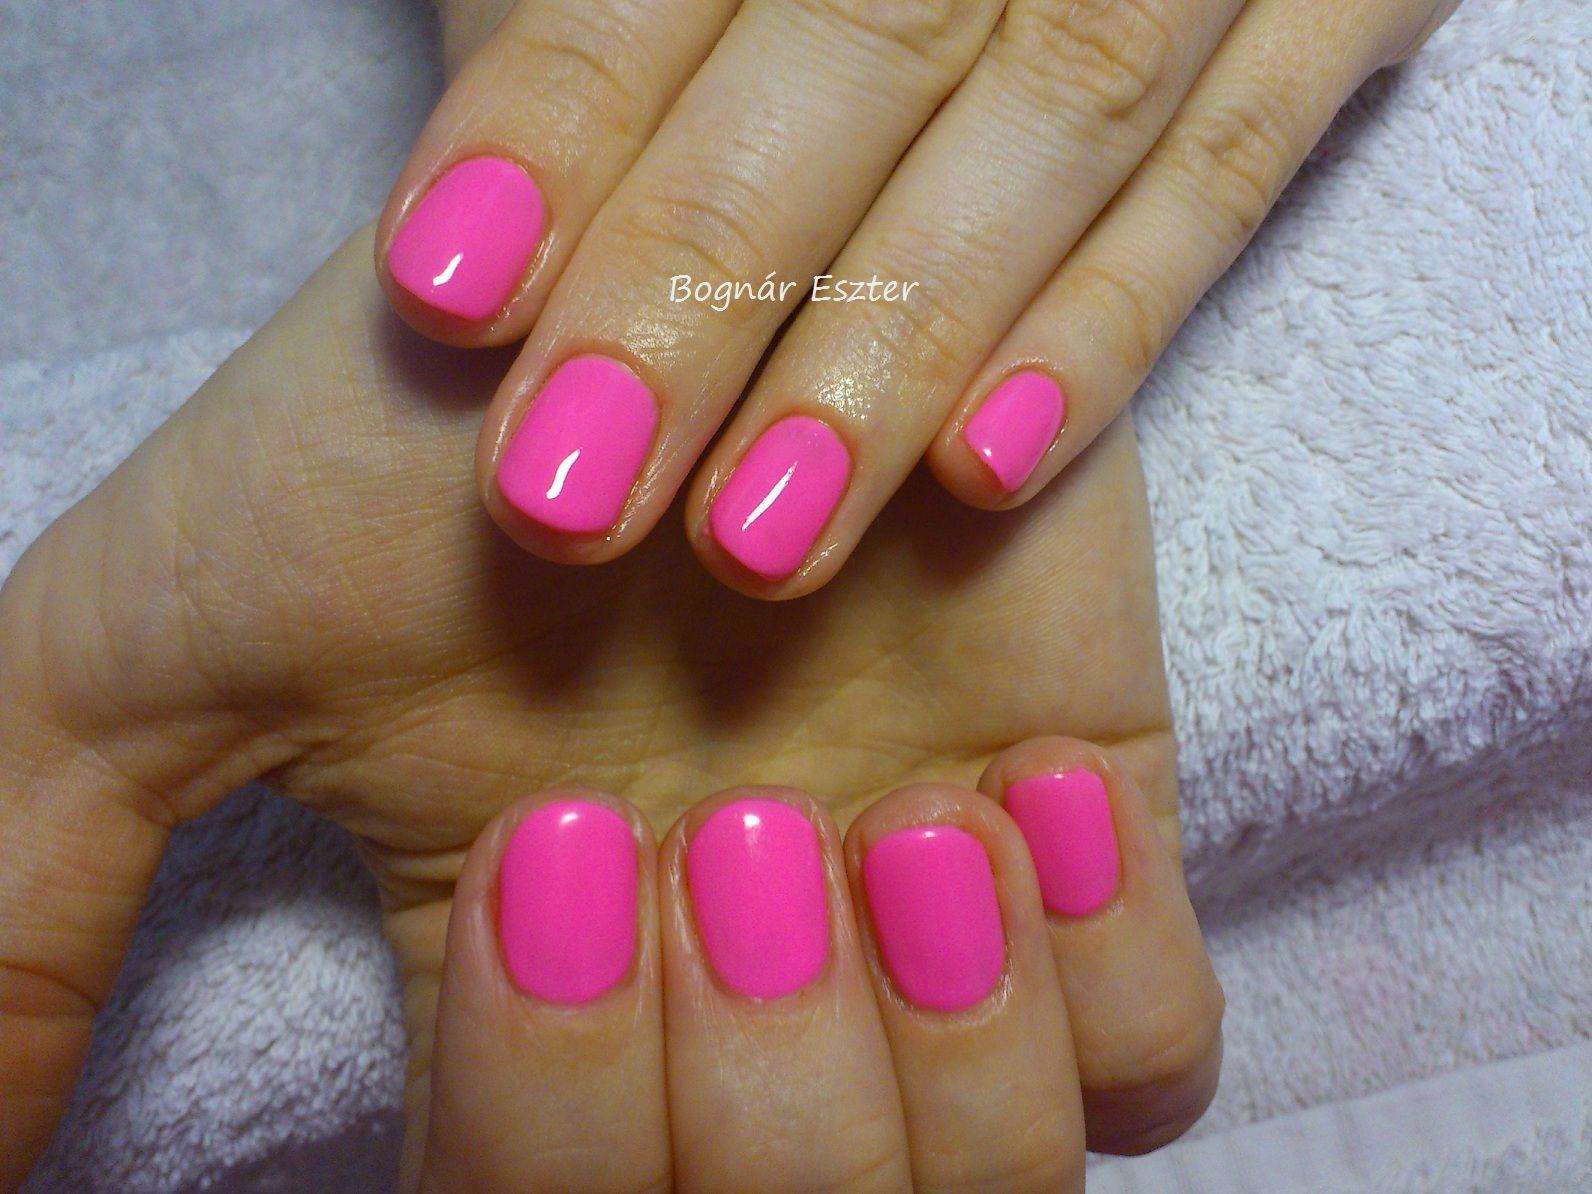 Gelish-Make You Blink Pink # neon pink nails | www.facebook.com/be ...